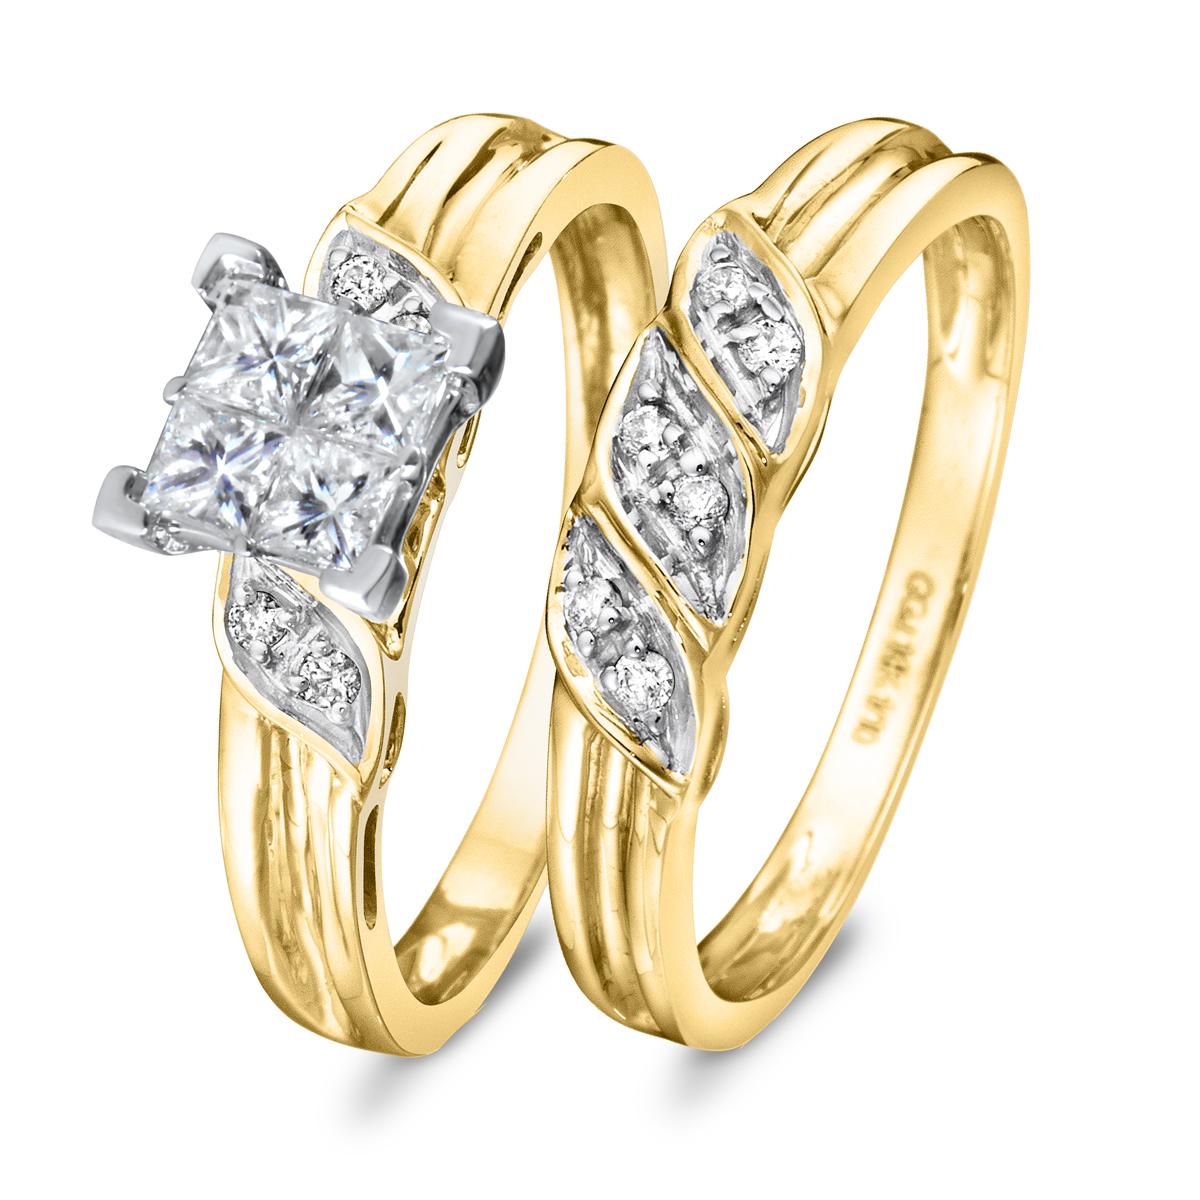 2/3 CT. T.W. Diamond Women's Bridal Wedding Ring Set 10K Yellow Gold